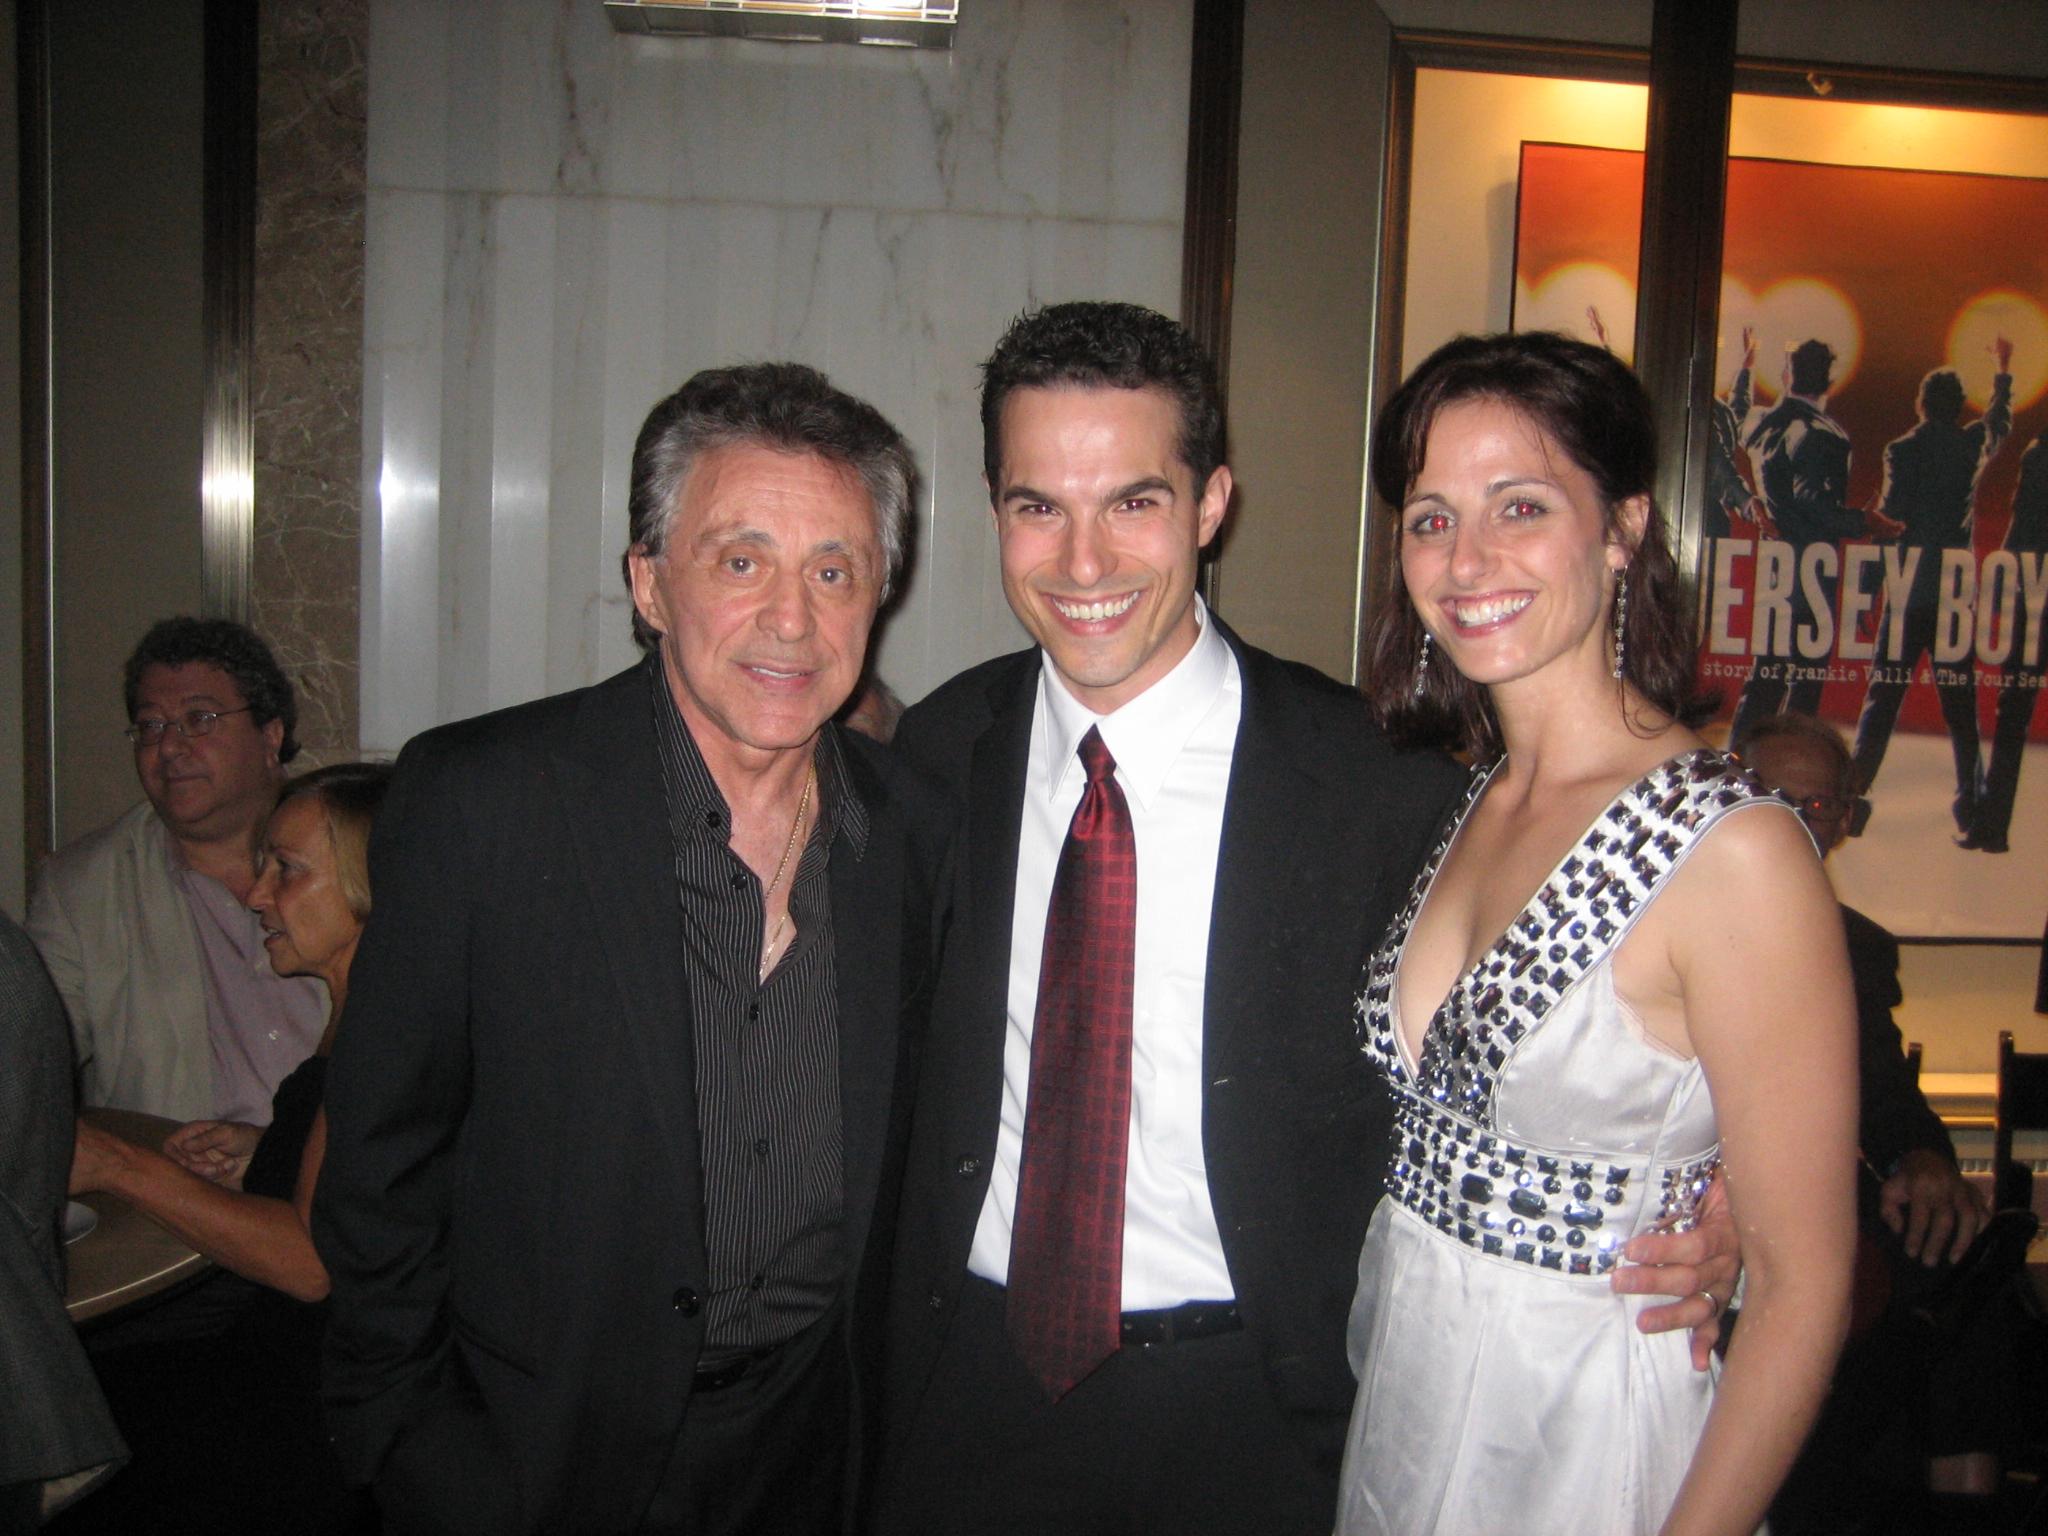 Frankie, JMC, and Rachel